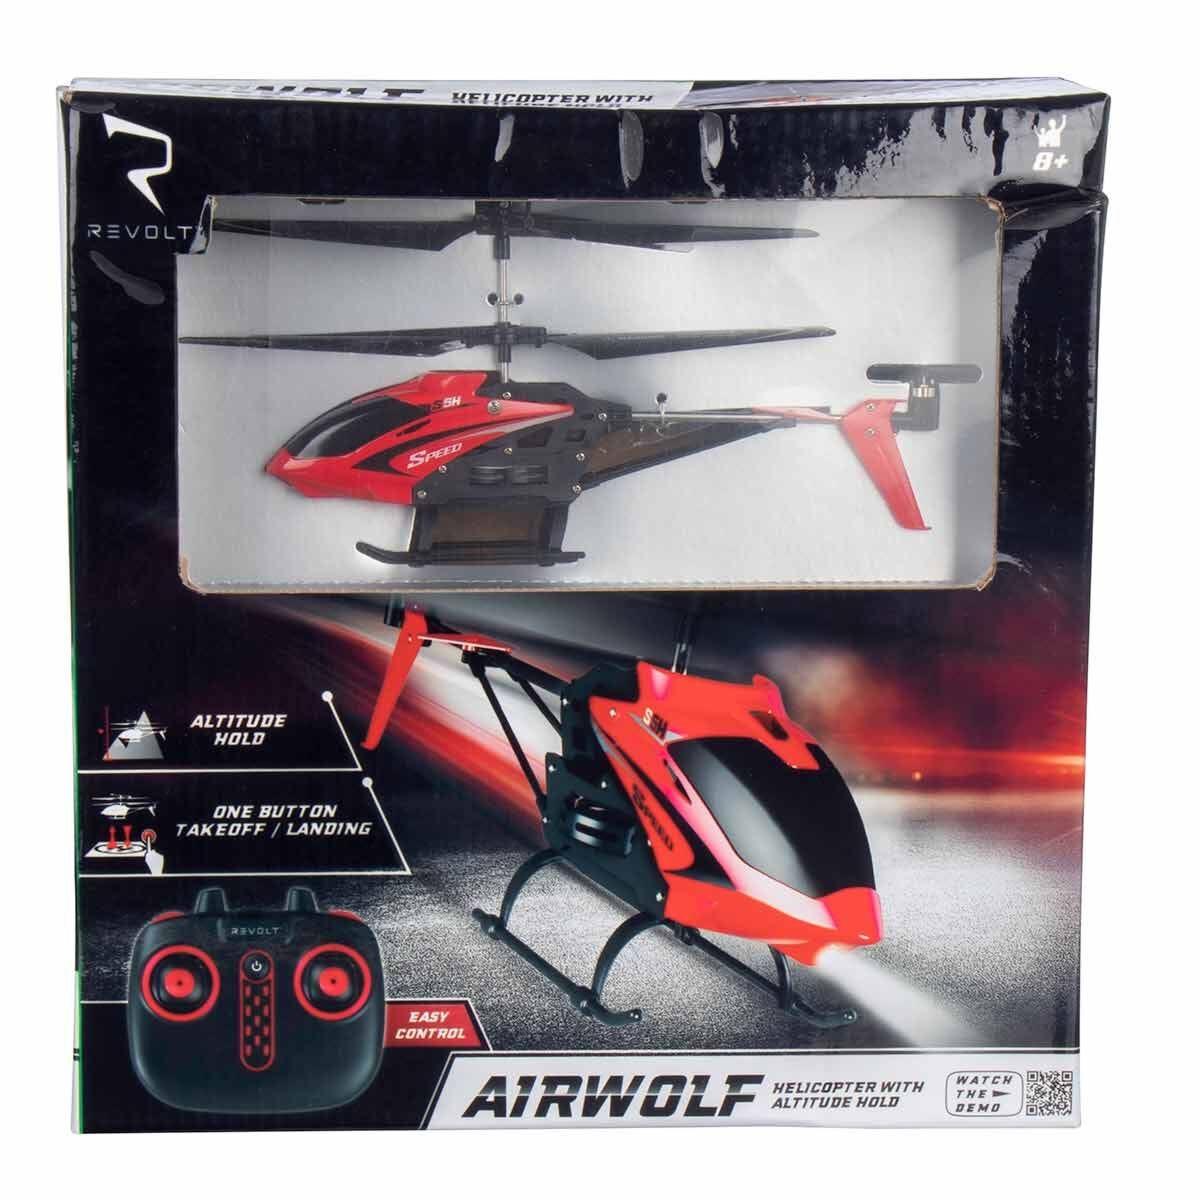 Revolt Airwolf Remote Control Helicopter